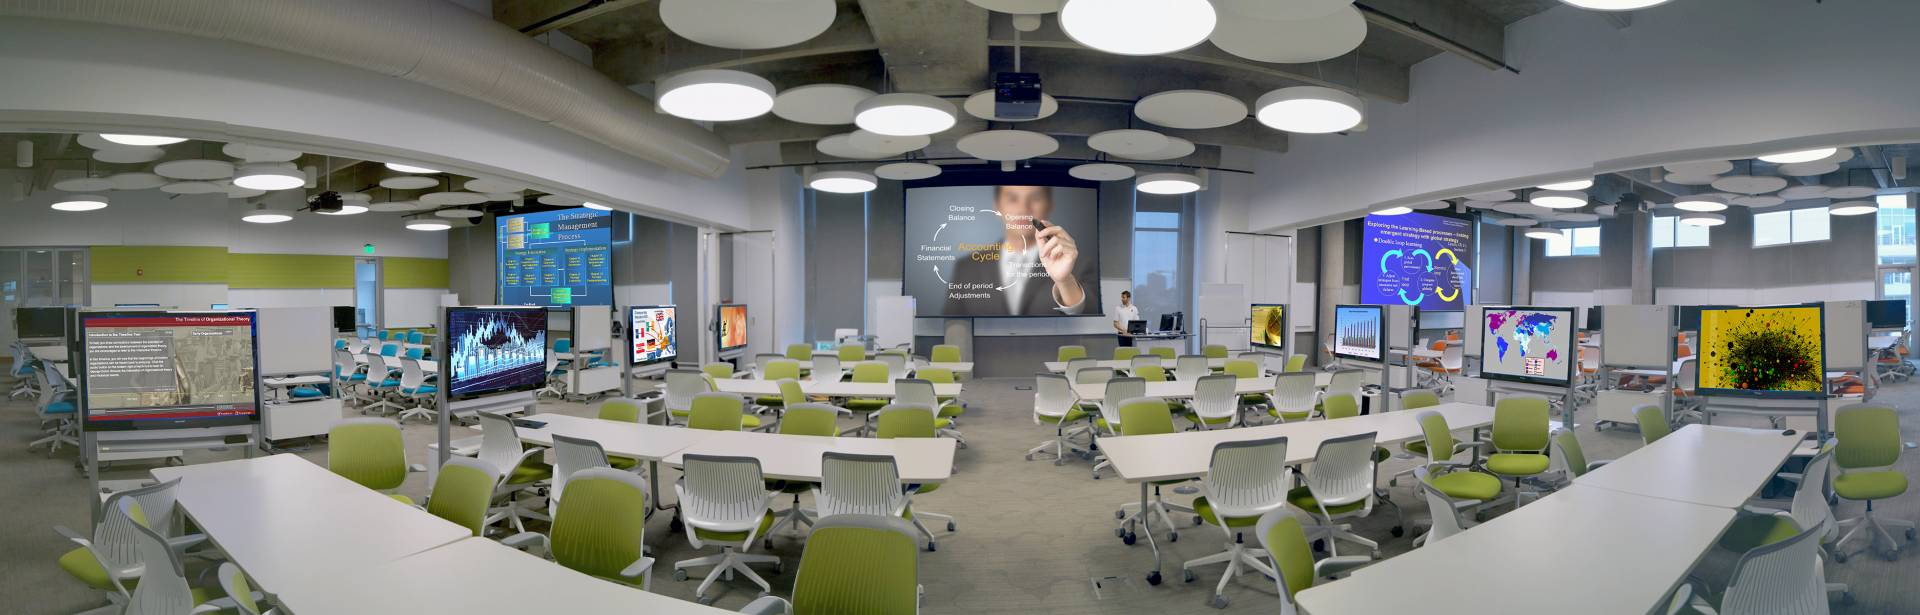 University of Missouri Kansas City Henry W. Bloch Executive Hall for Entrepreneurship and Innovation